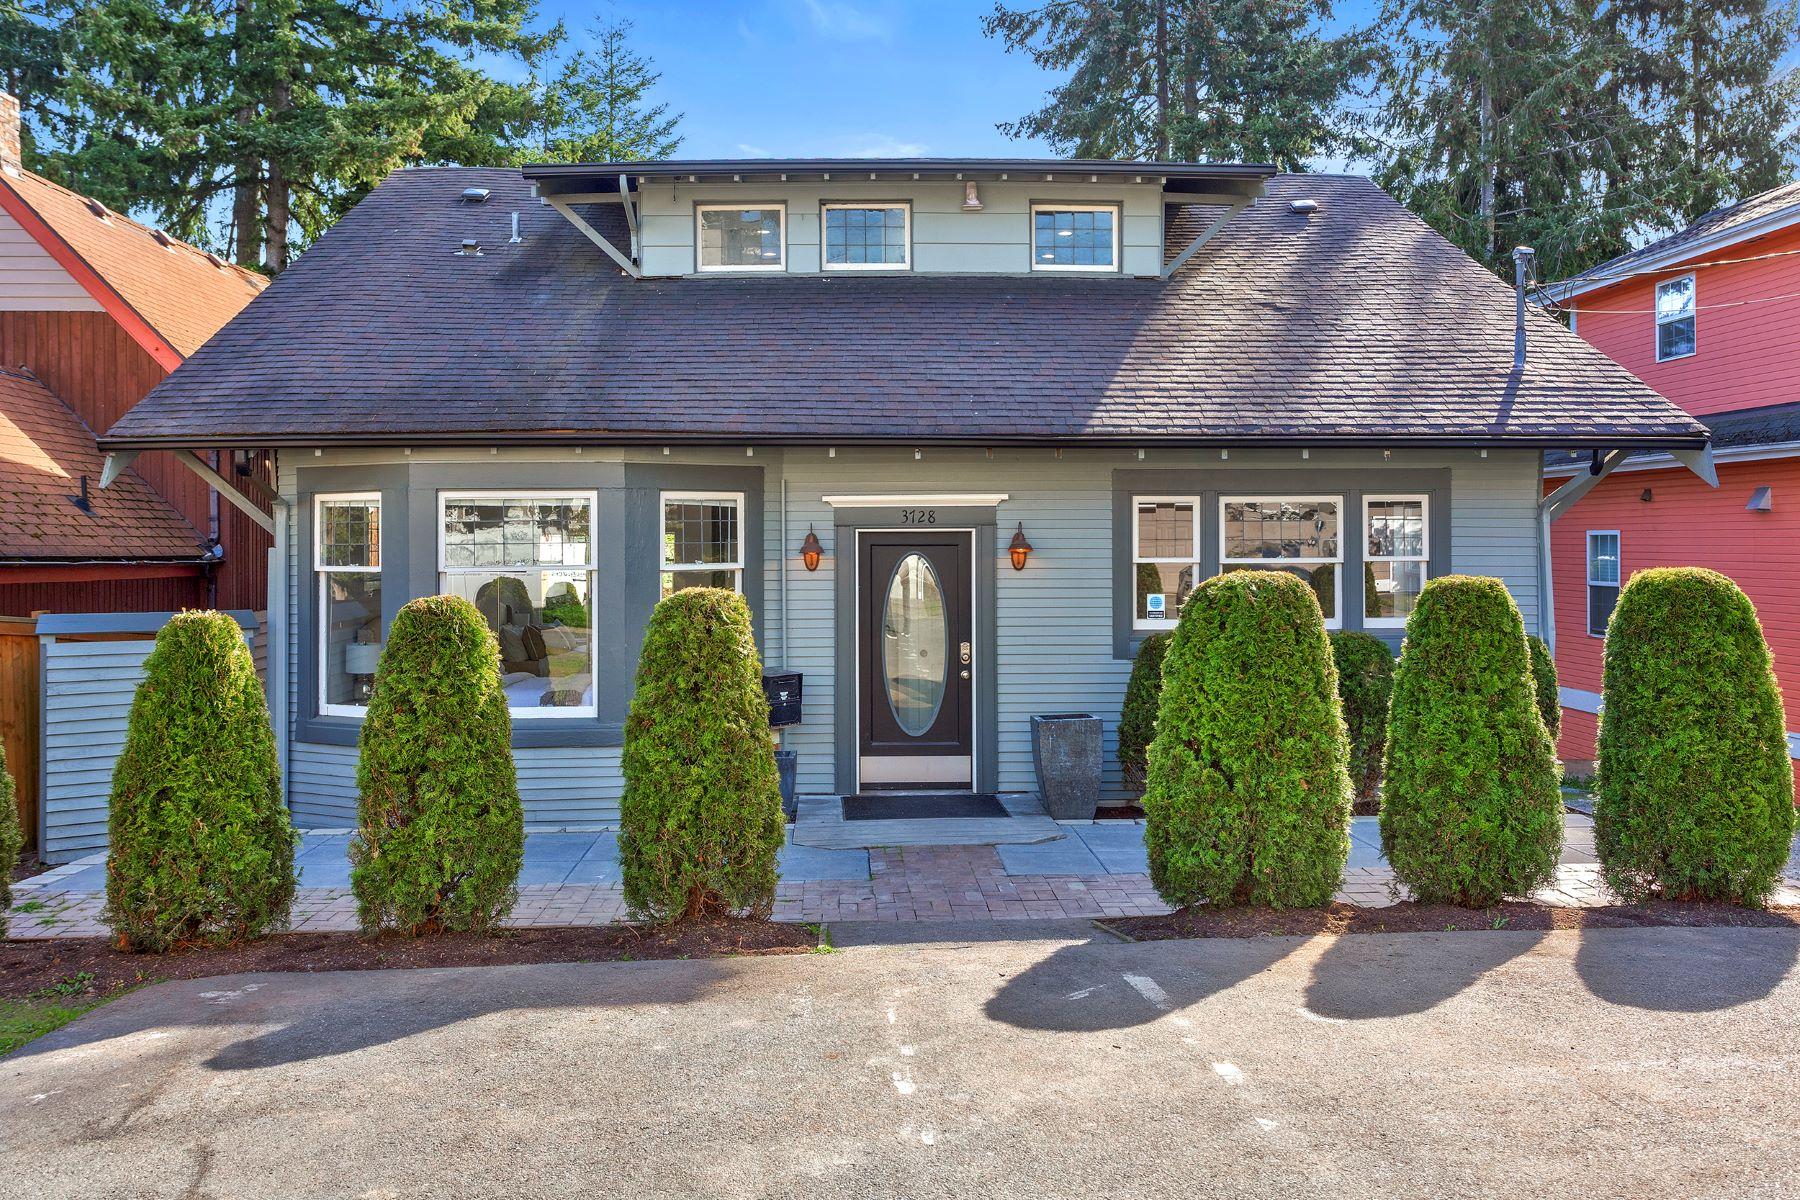 Multi-Family Homes for Sale at Restored Everett Duplex 3728 Rucker Ave Everett, Washington 98201 United States